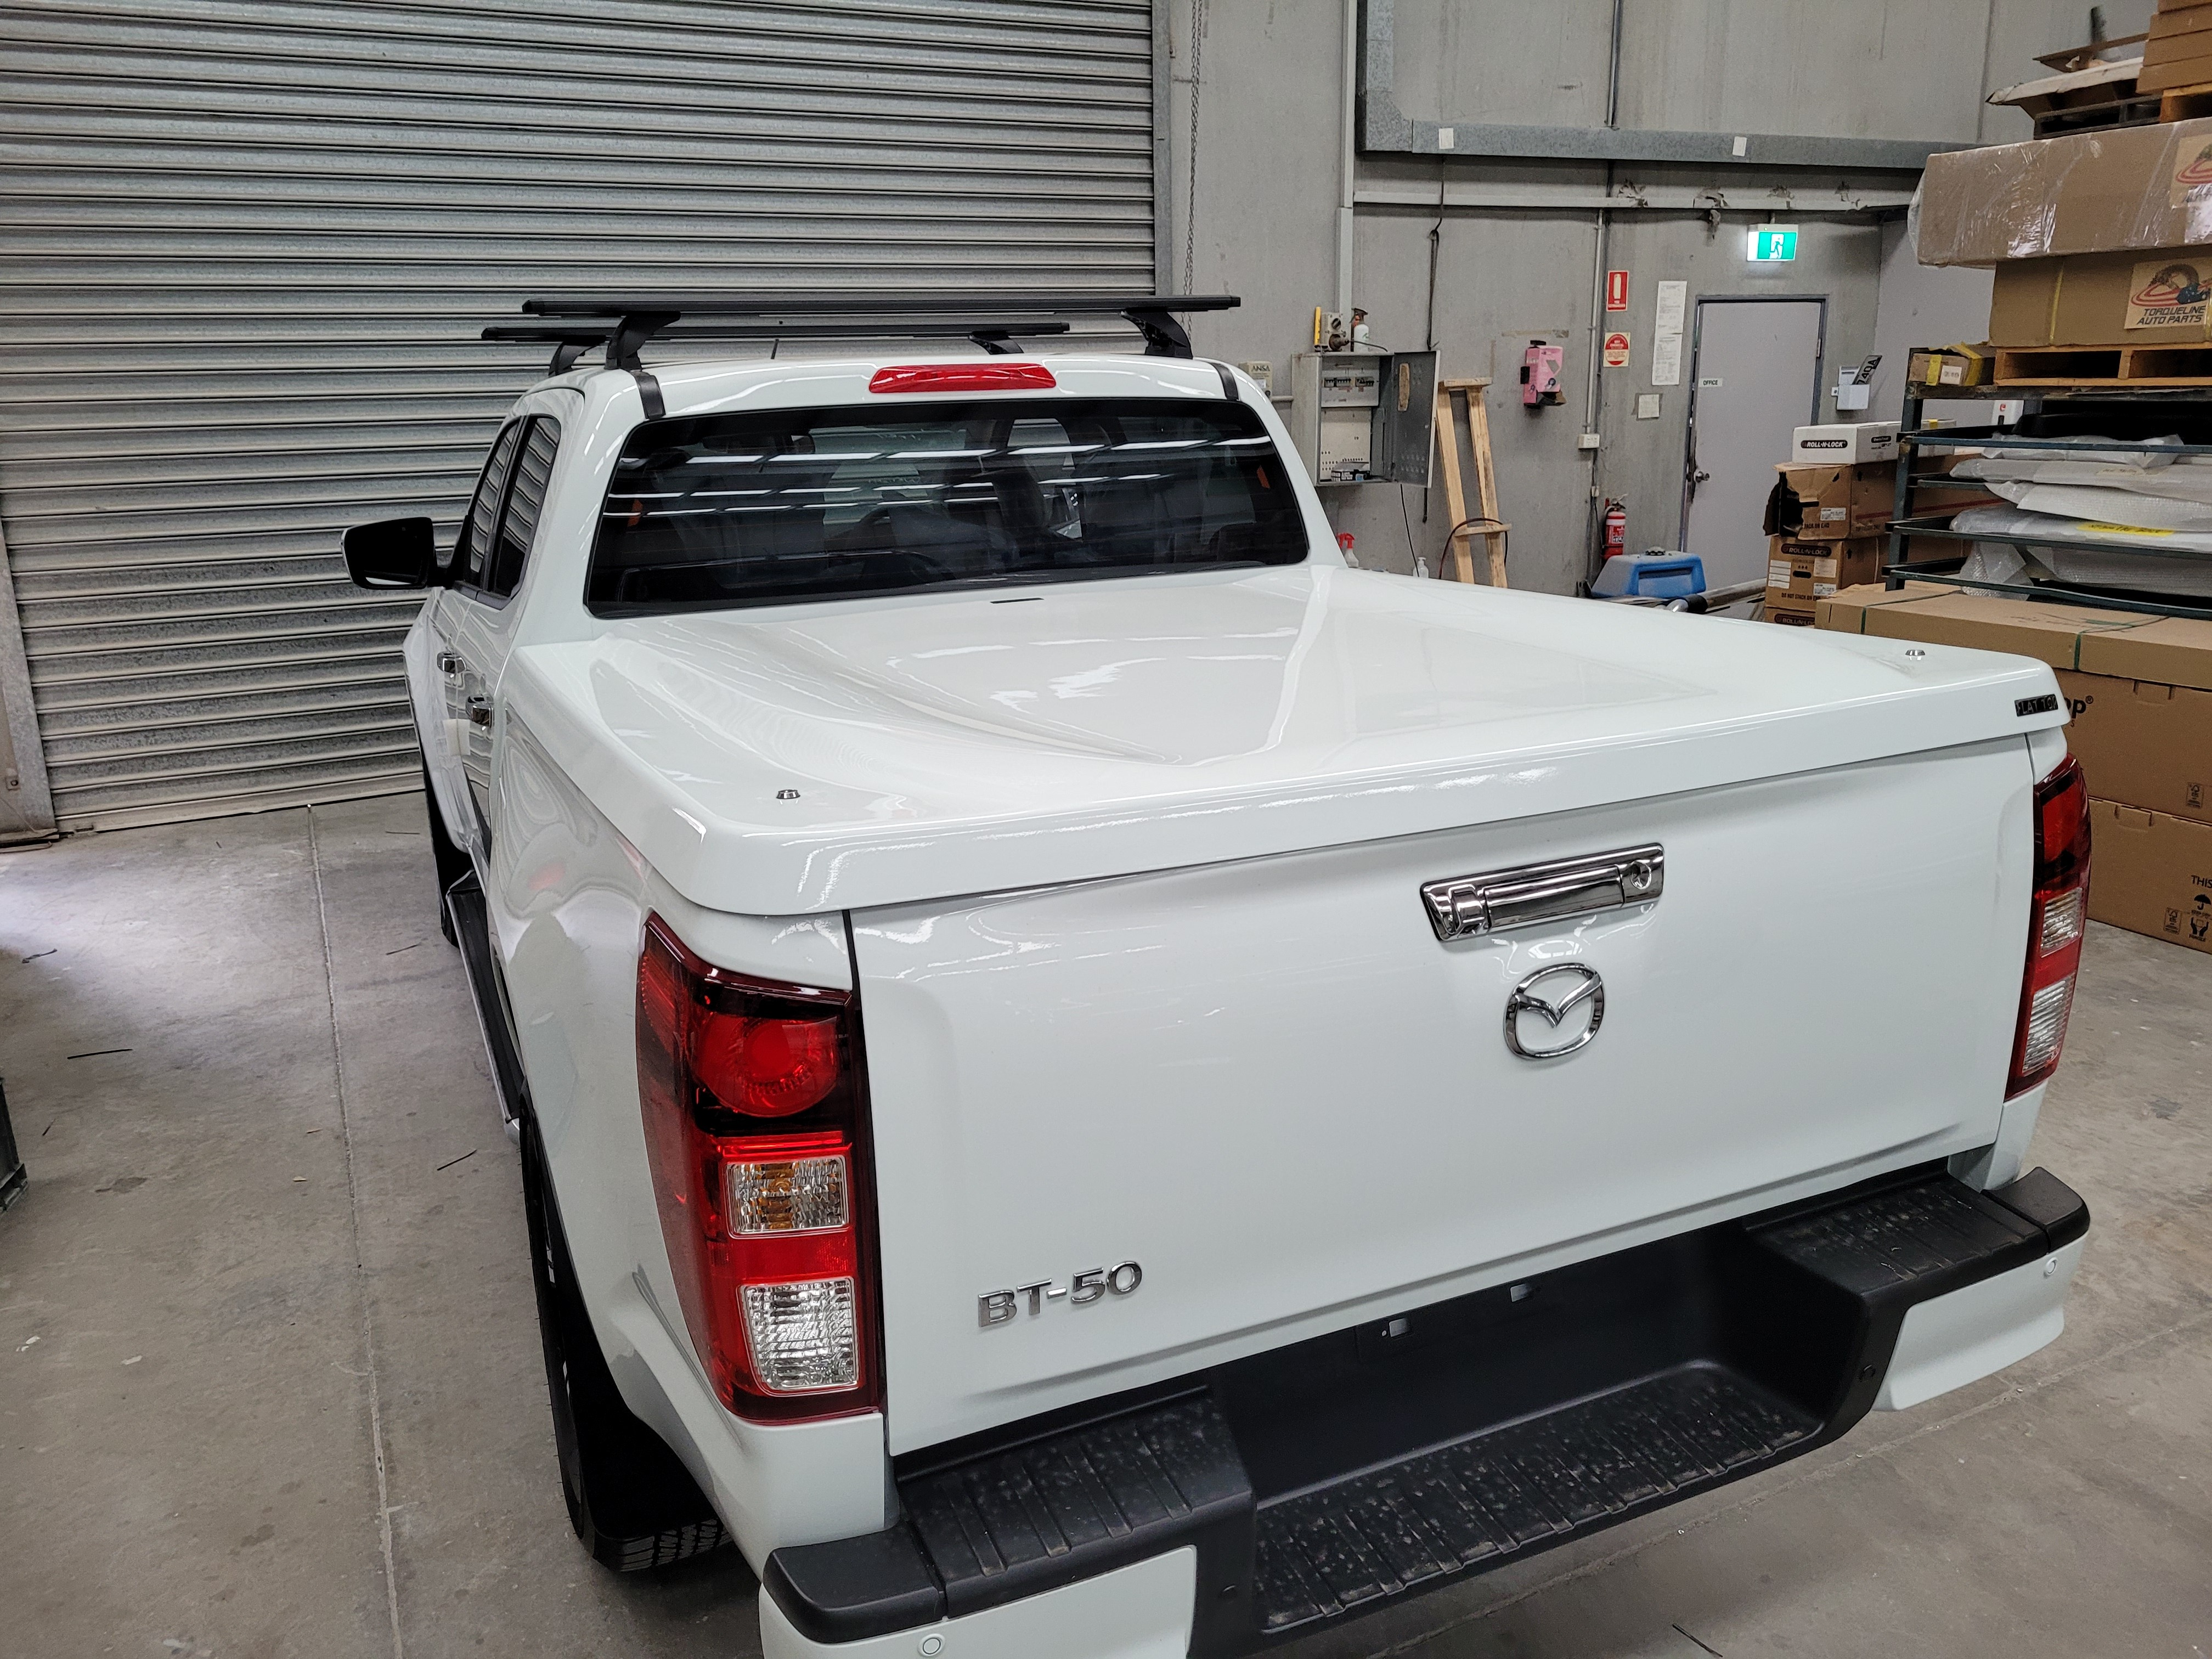 Mazda bt50 ite lid